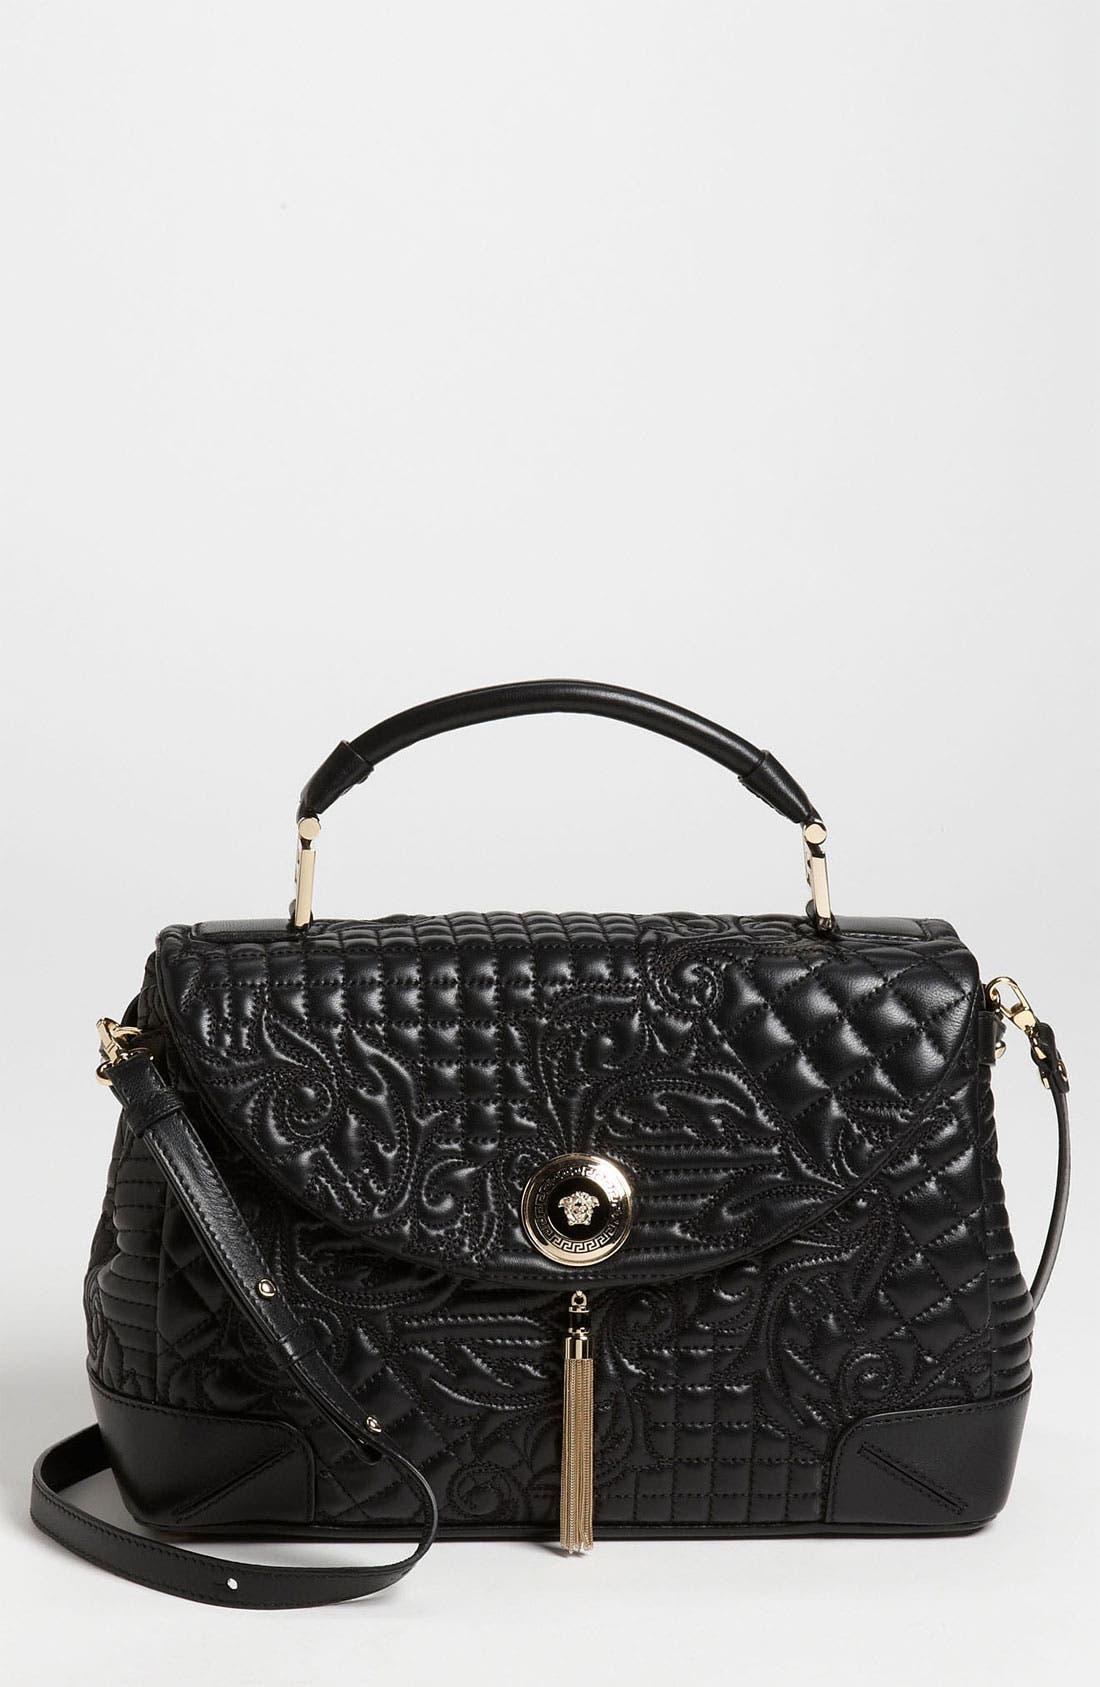 Main Image - Versace 'Vanitas' Embroidered Nappa Lambskin Leather Satchel